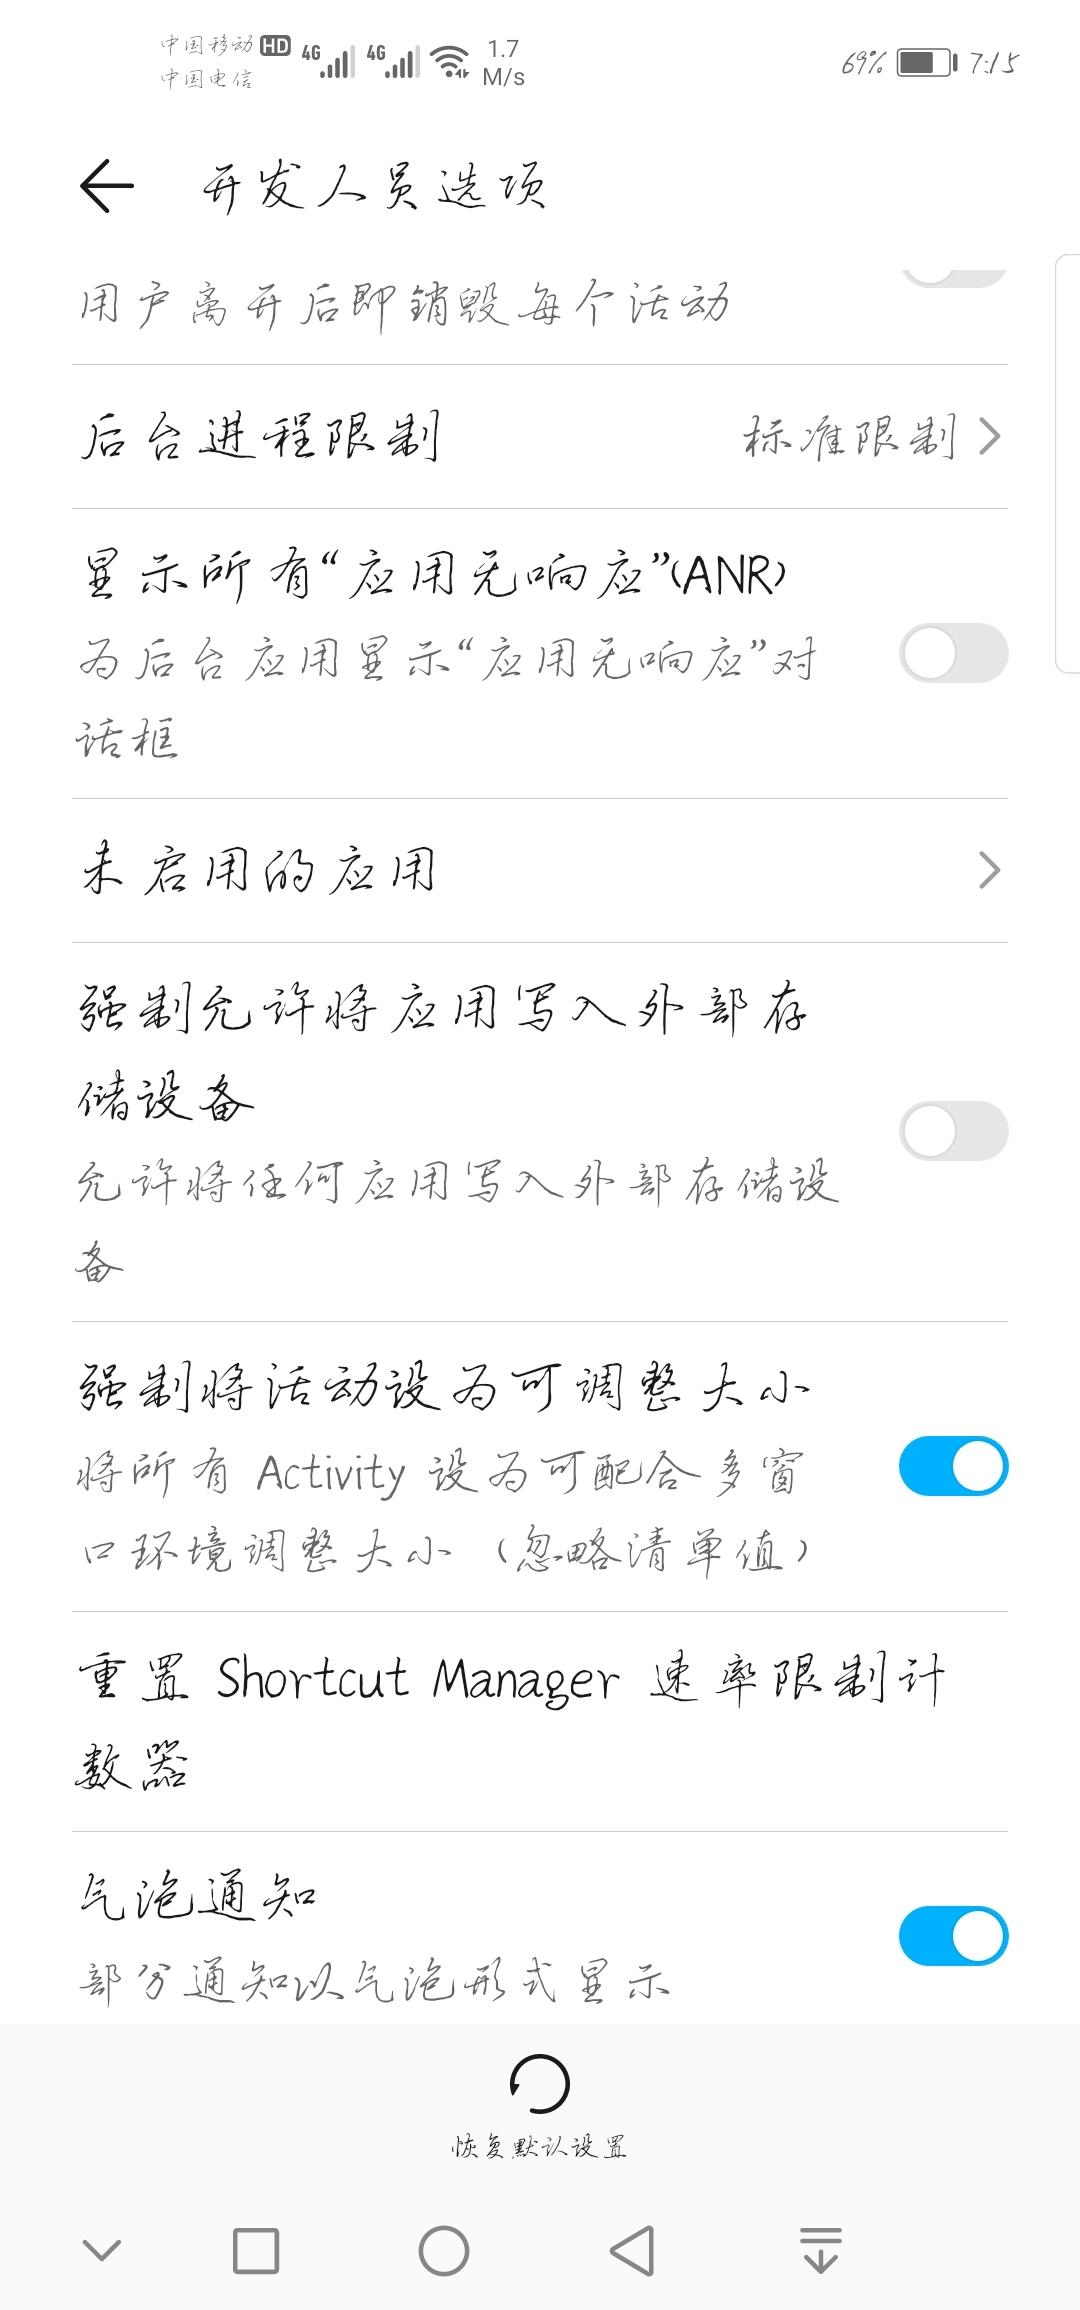 Screenshot_20200517_191550_com.android.settings.jpg